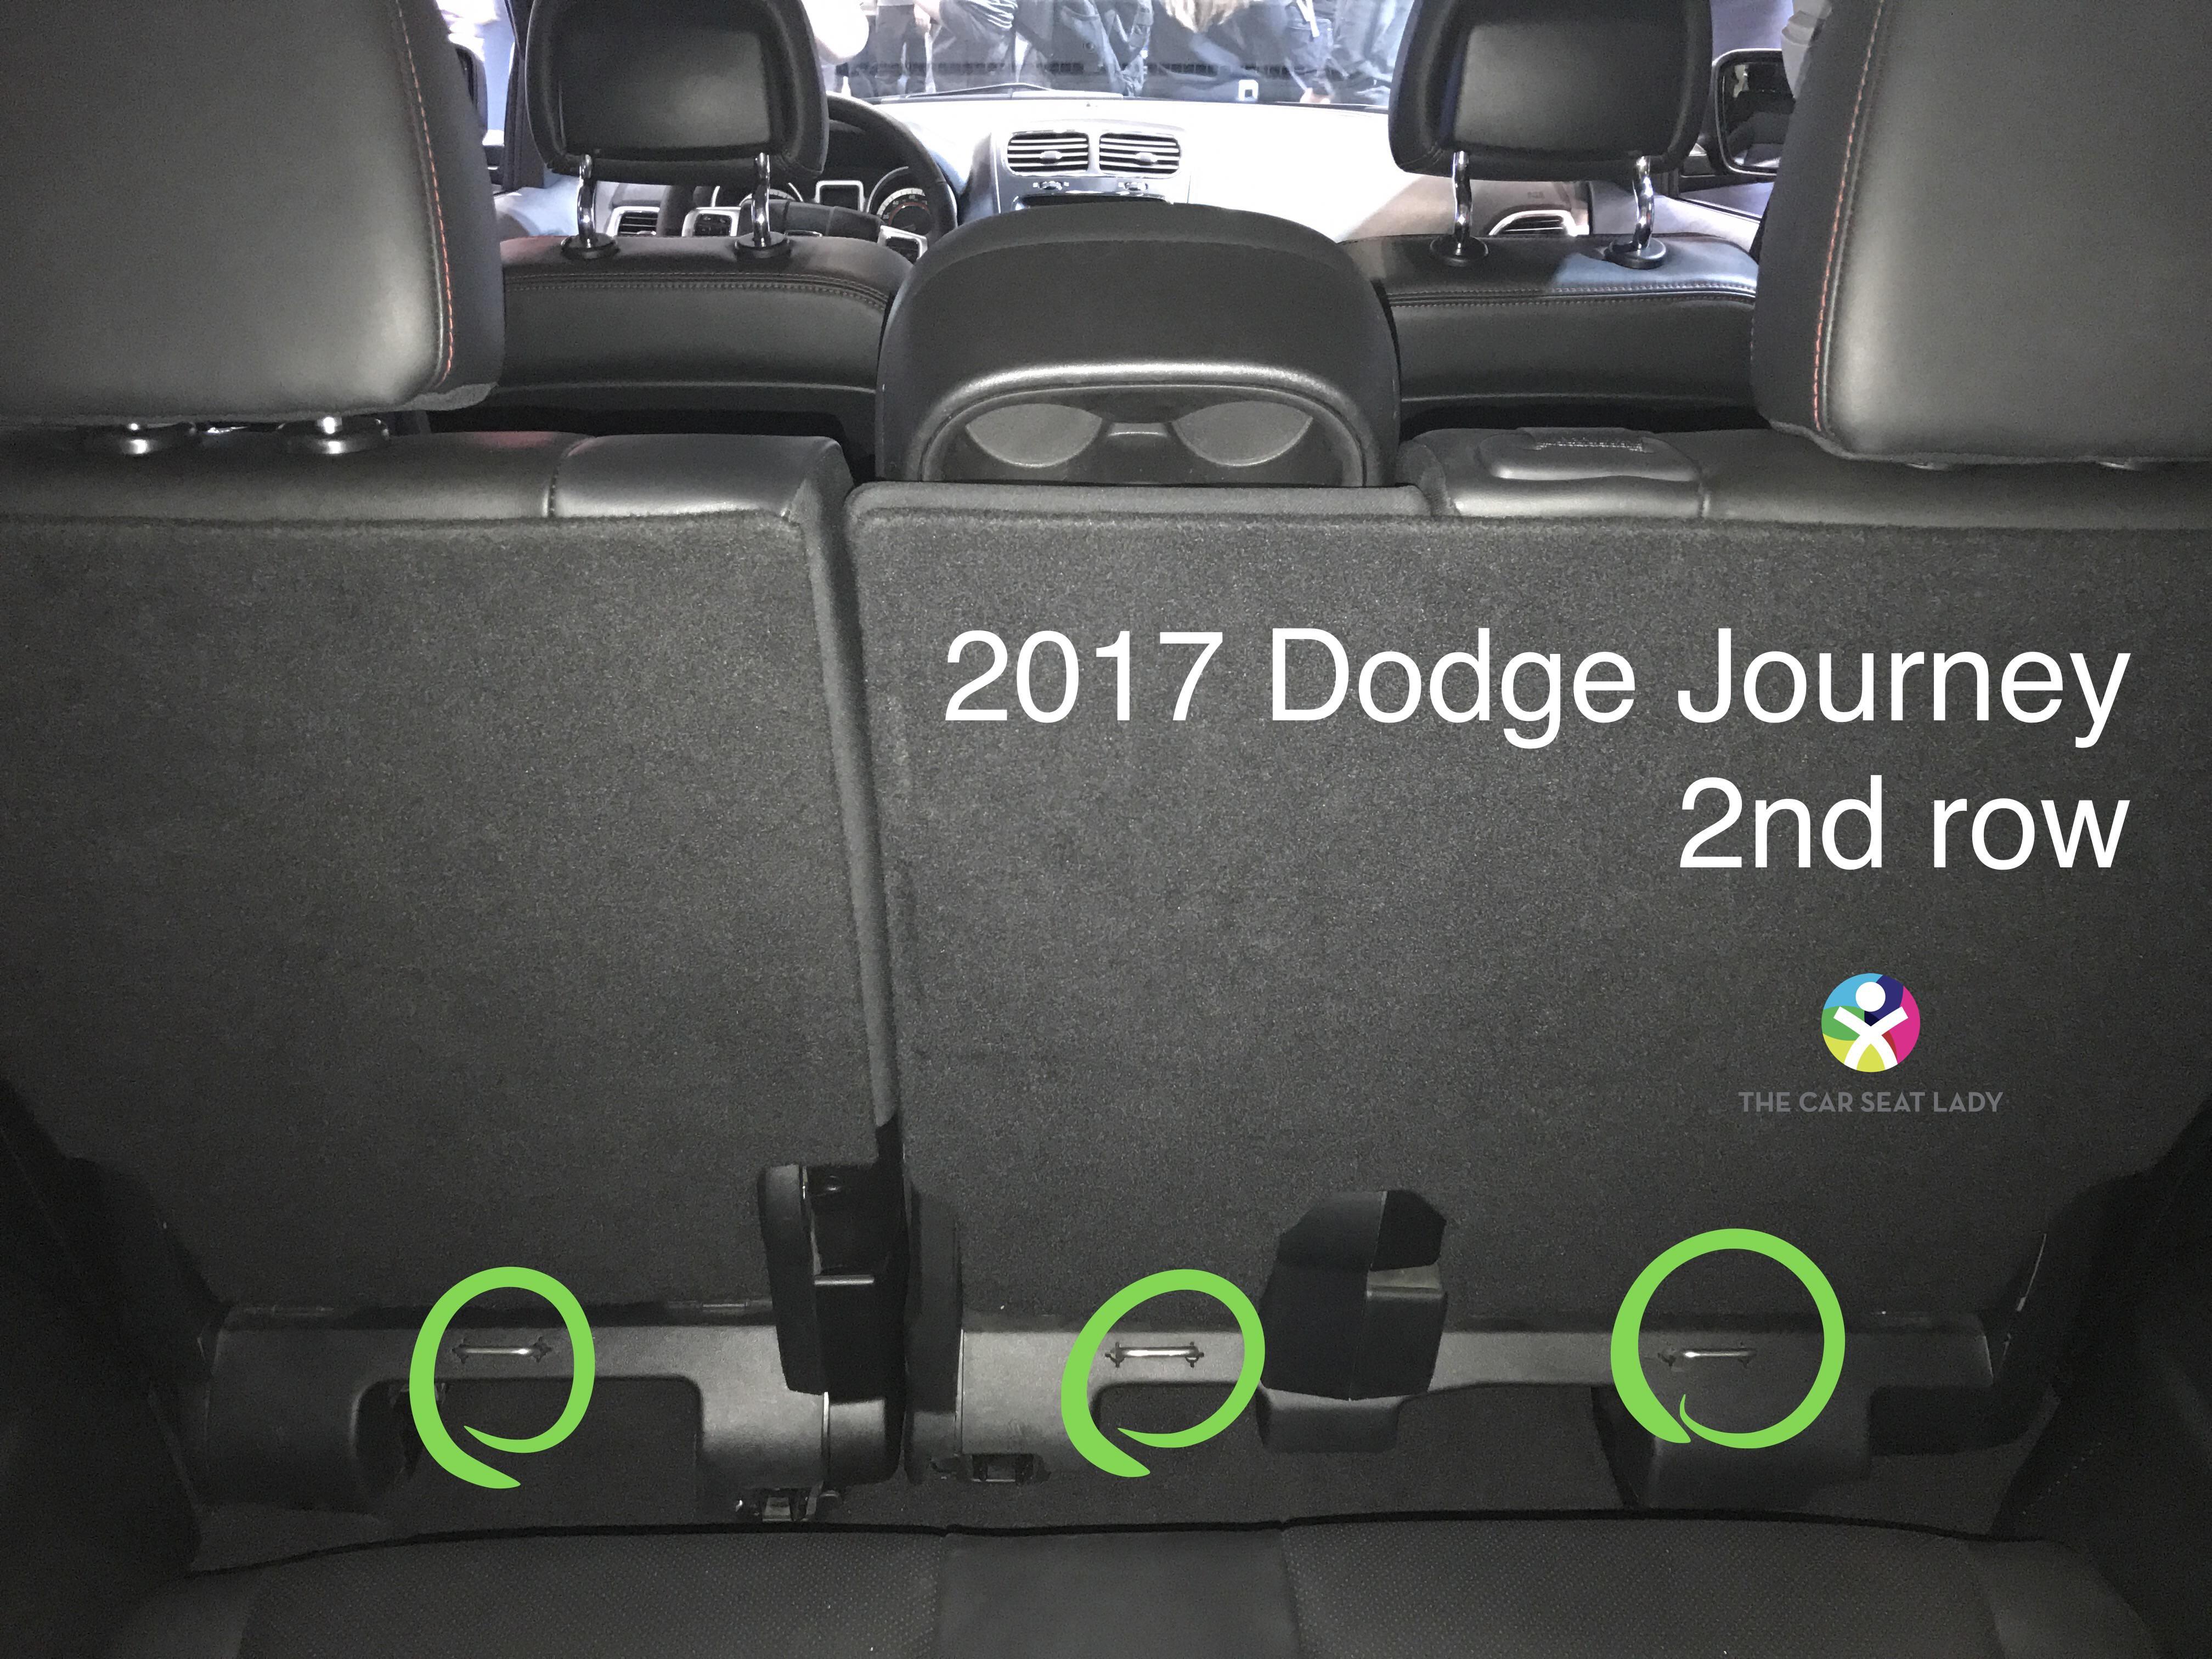 2018 Dodge Journey >> The Car Seat Lady – Dodge Journey